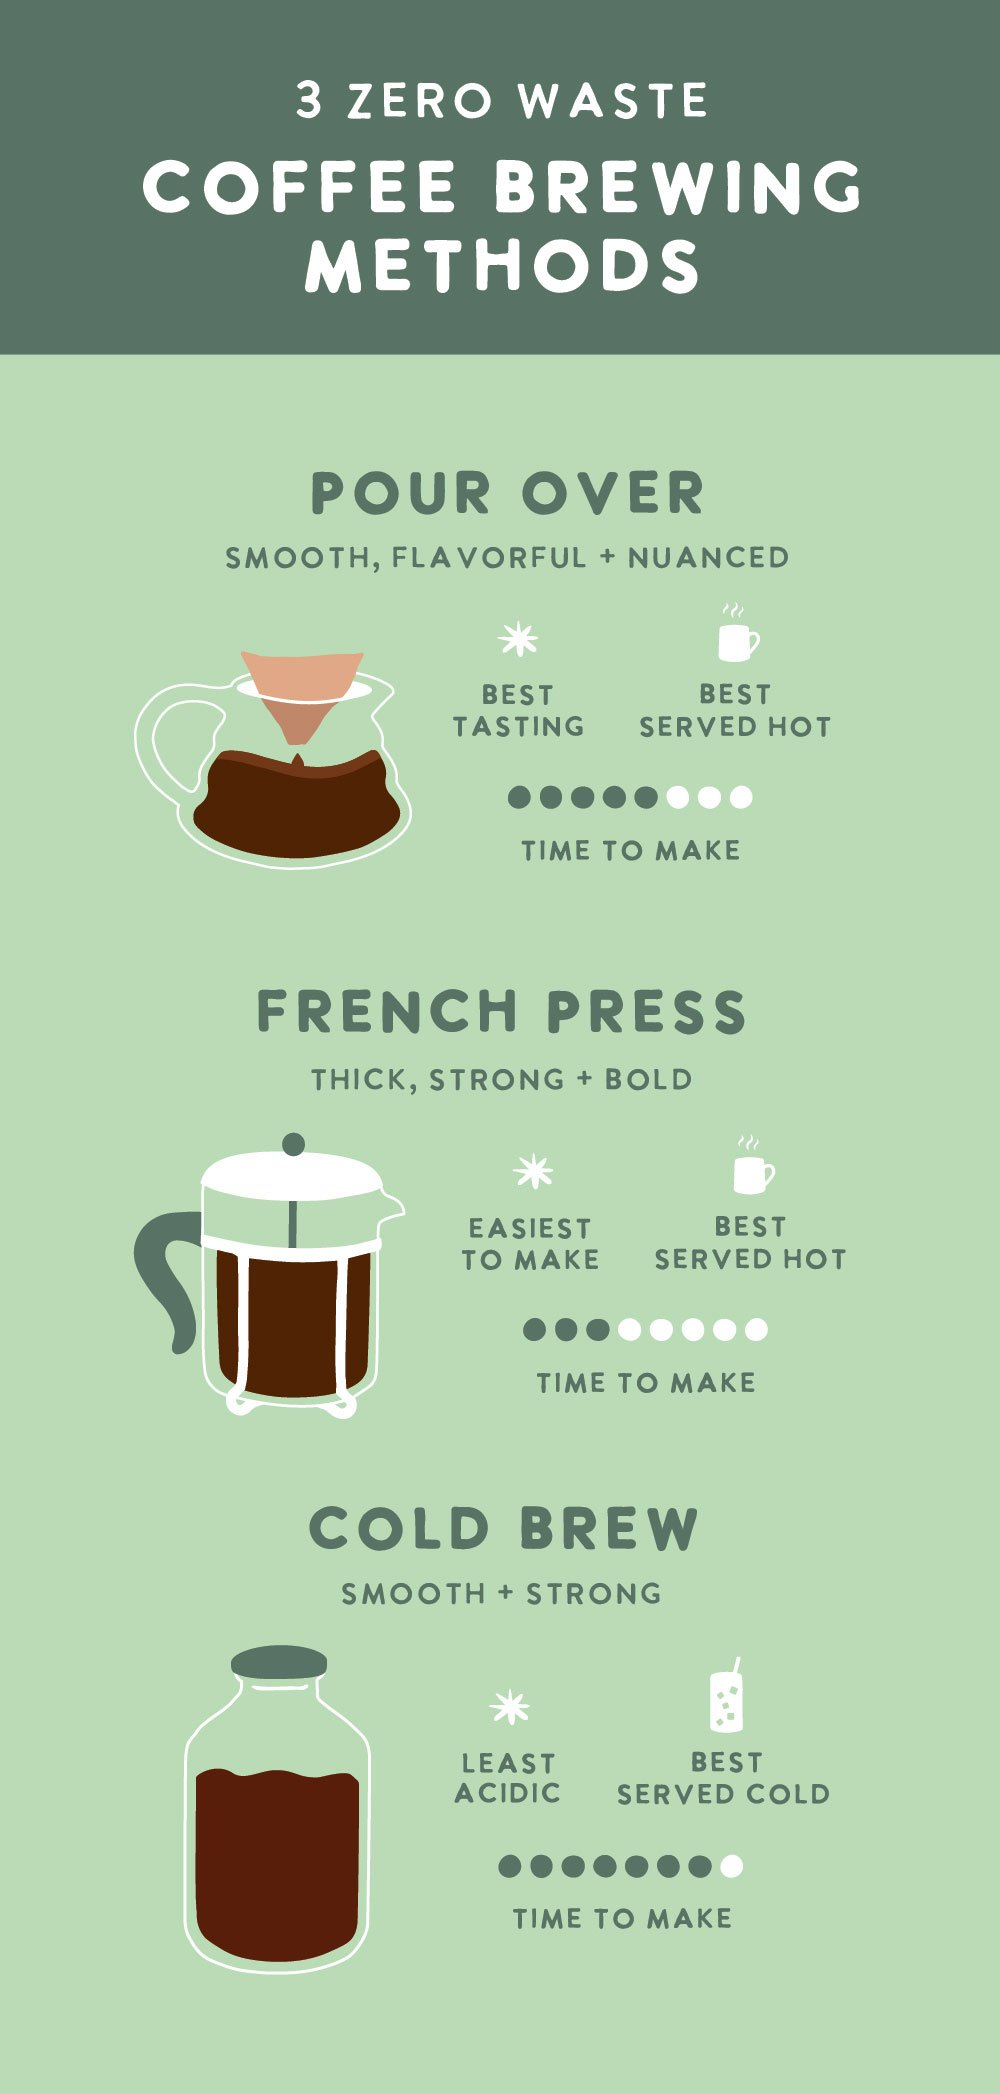 Zero Waste Coffee Brewing Methods